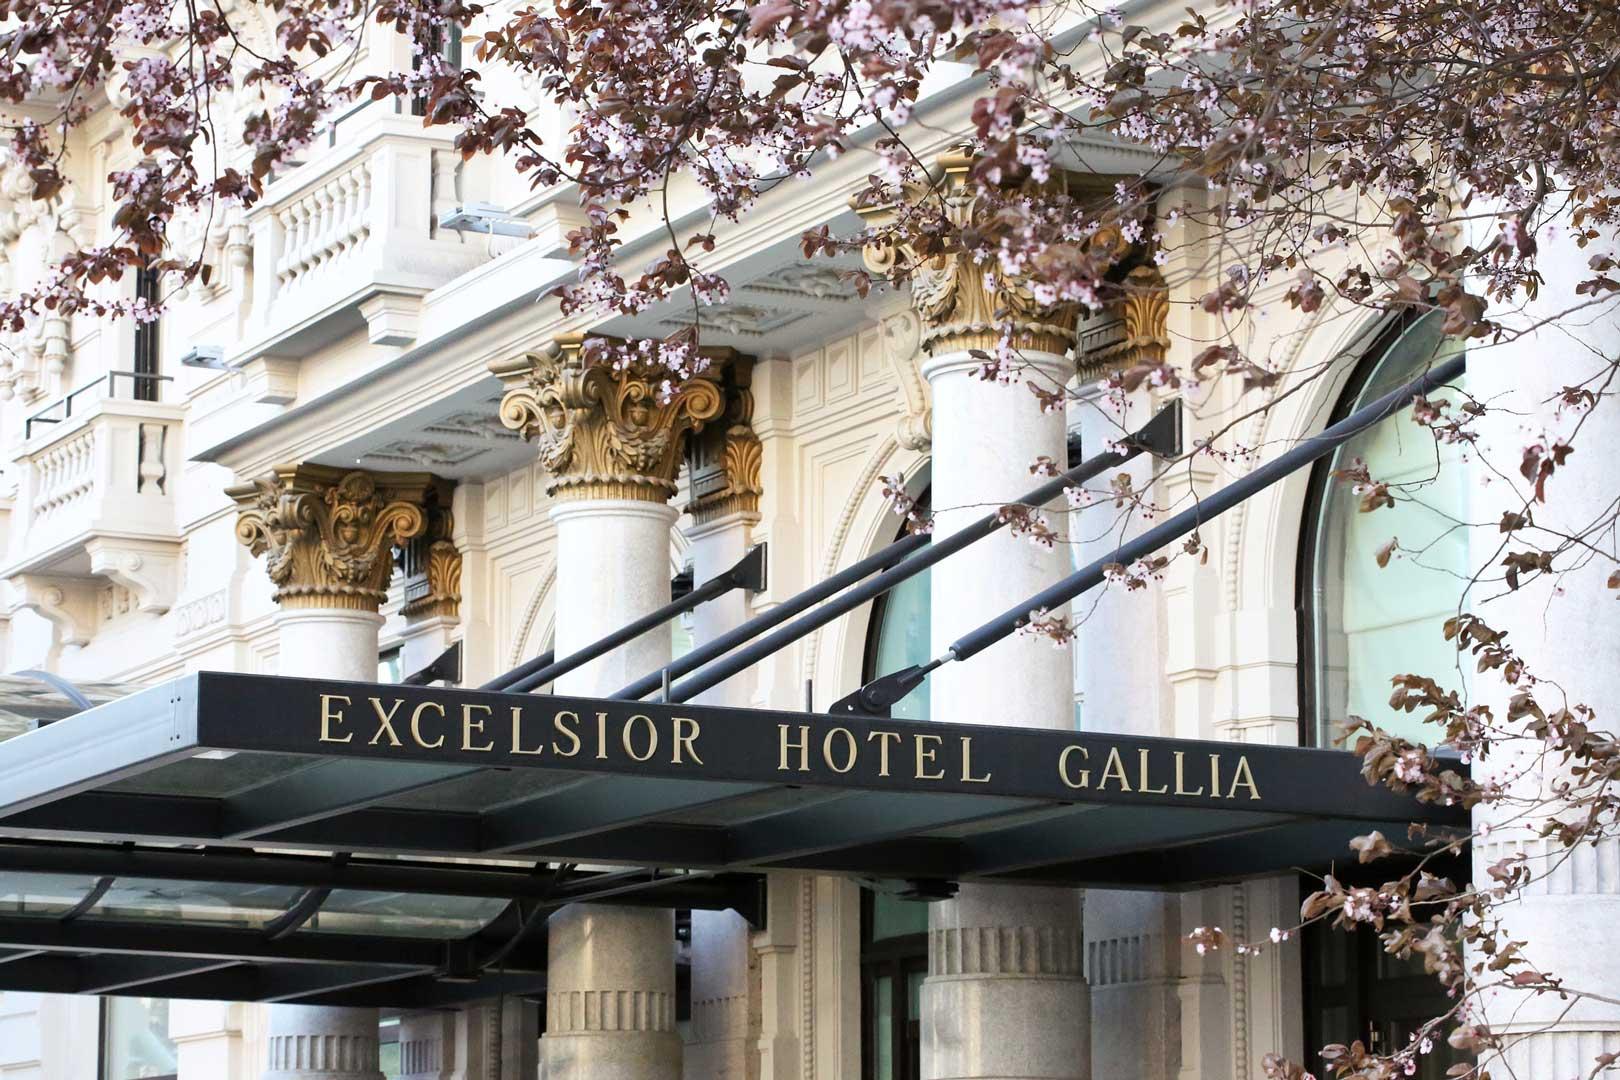 Excelsior Hotel Gallia | Esterno